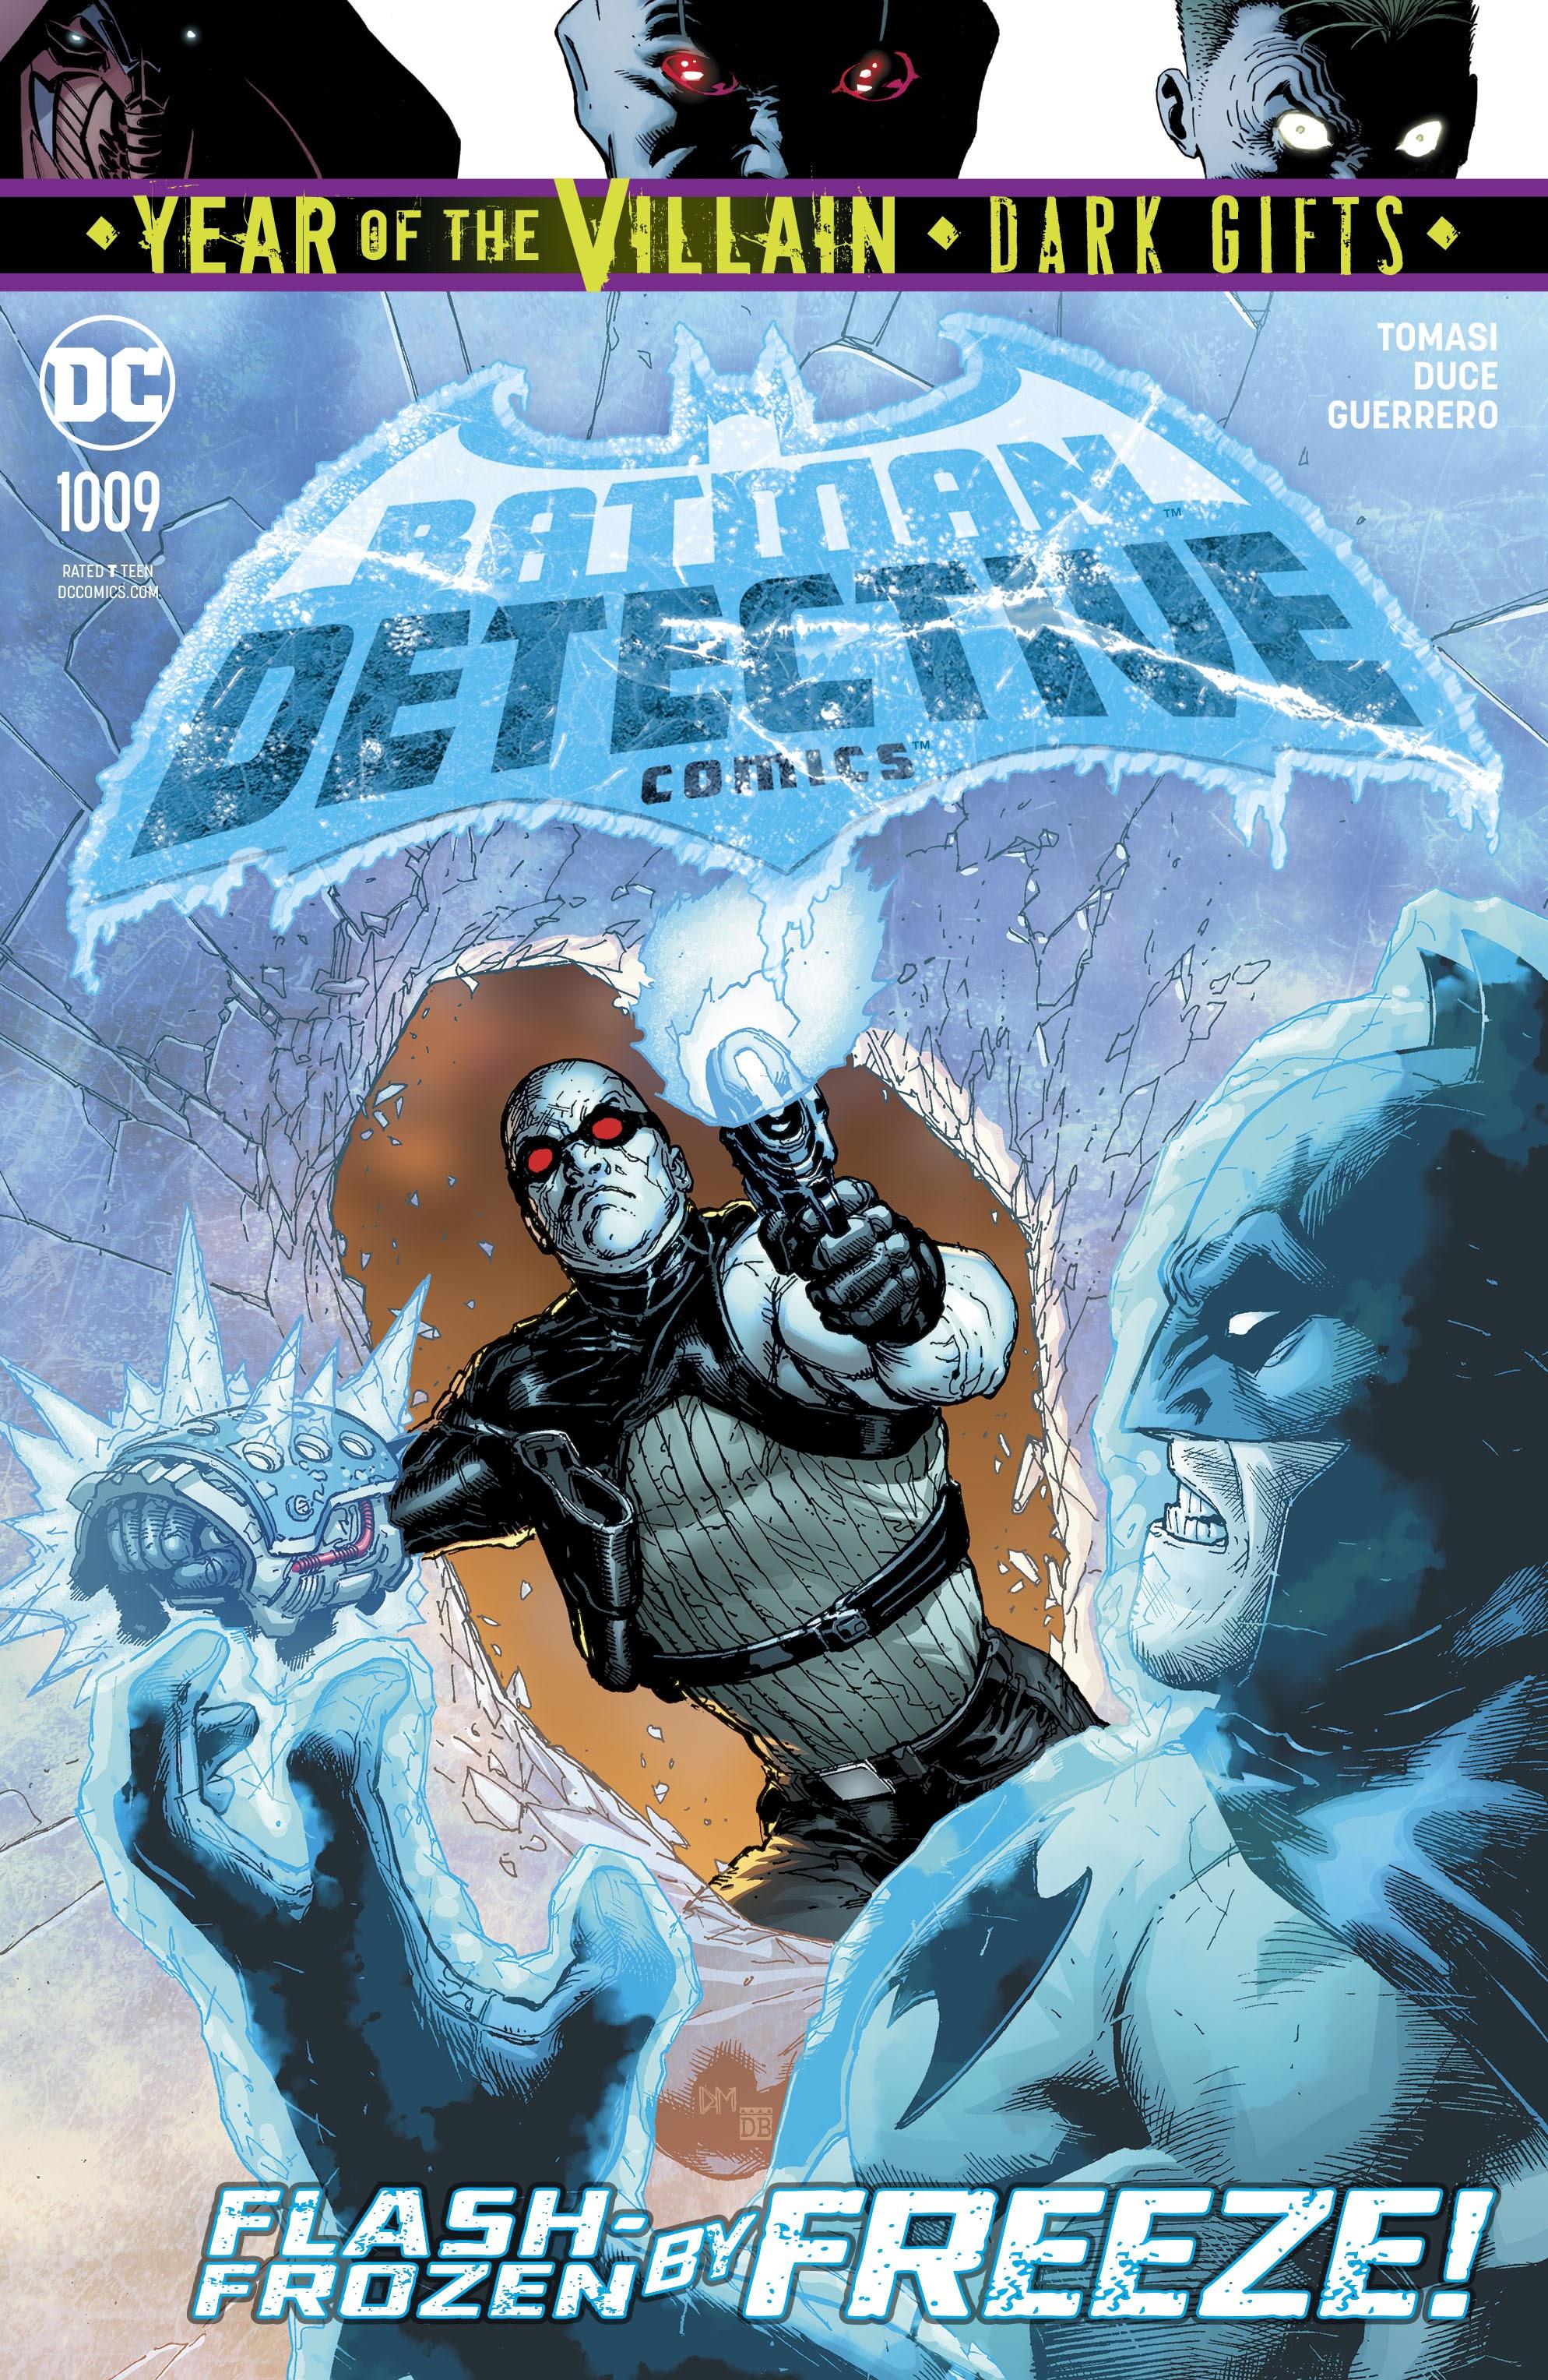 Detective Comics (2016) 1009 Page 1